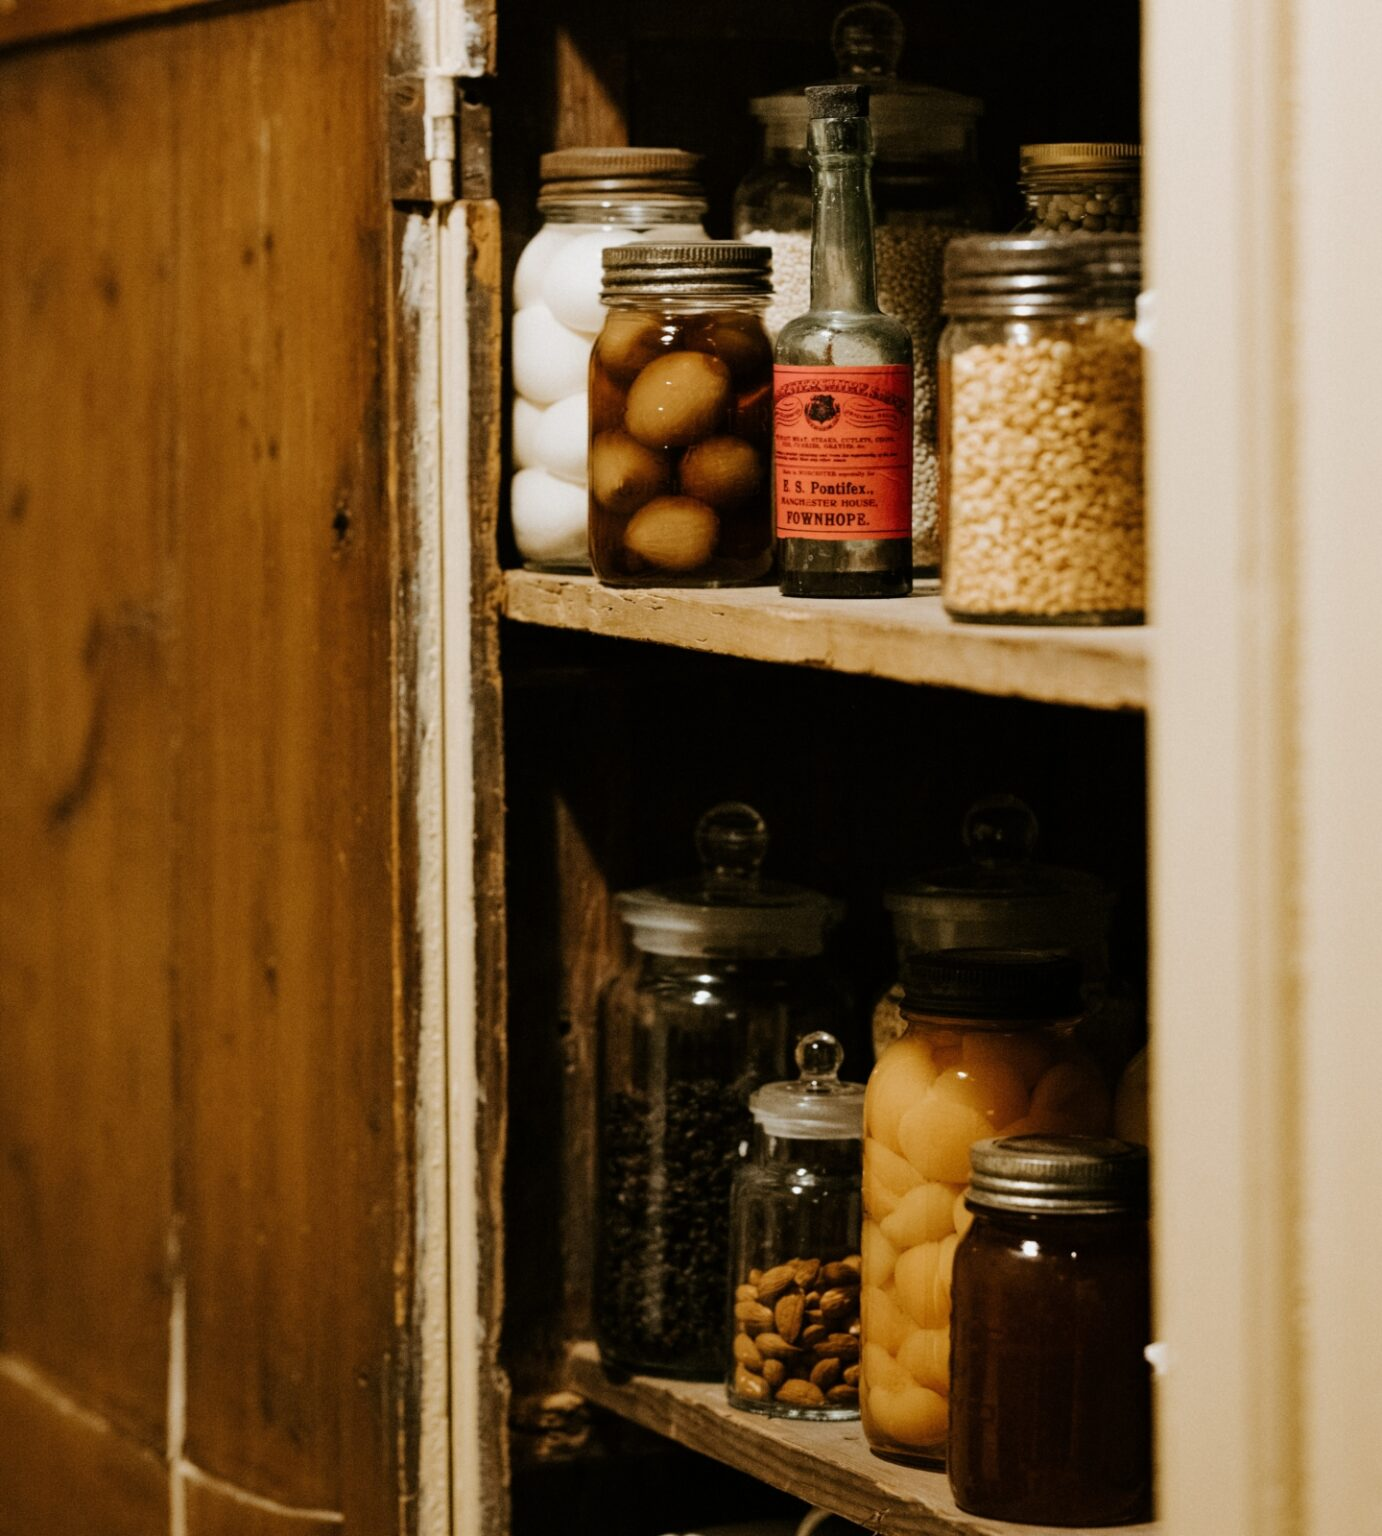 Jars in the pantry